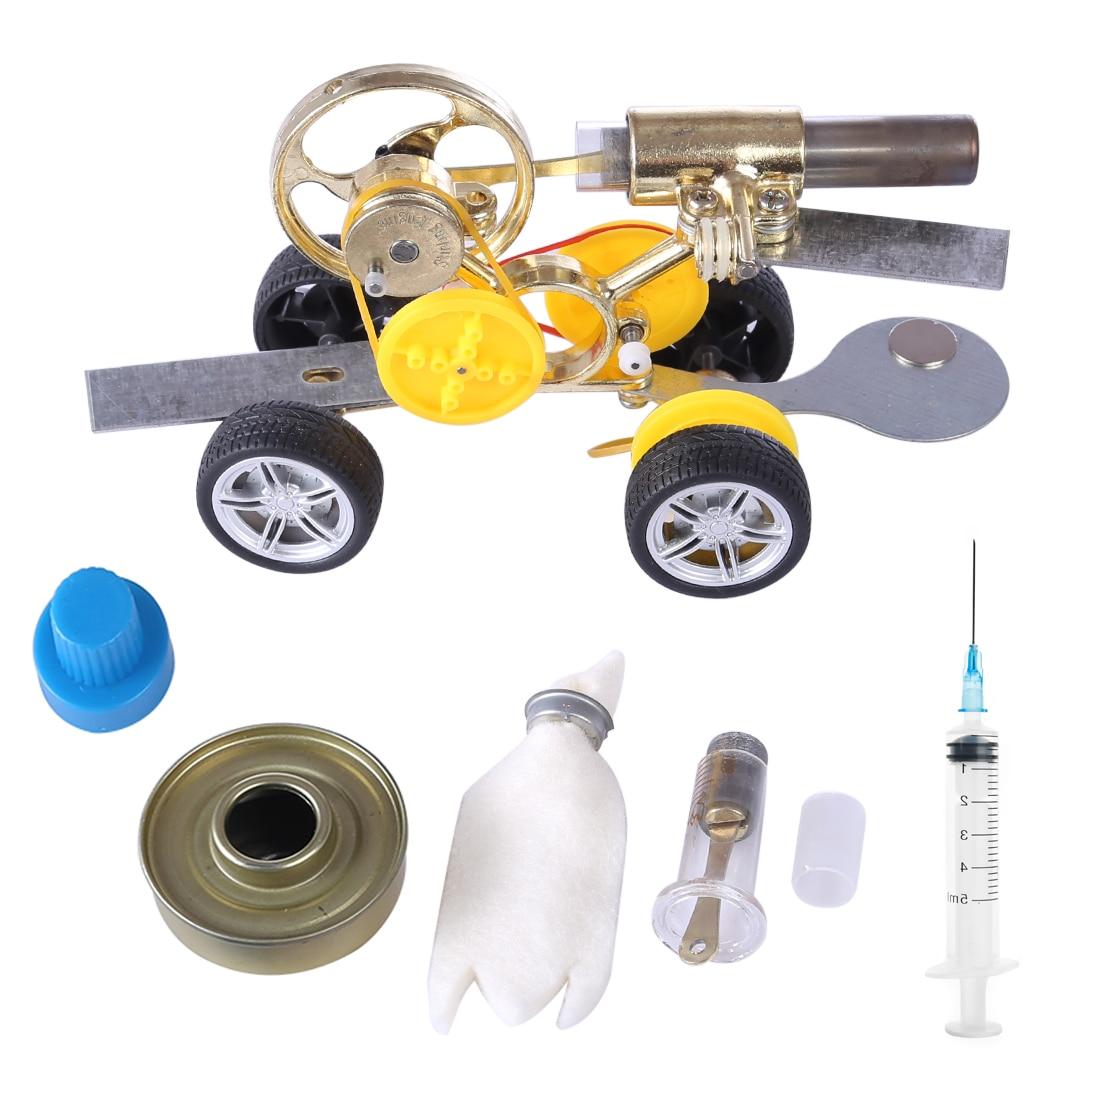 Stirling Engine Model Motor Kits Driving Car Model Building Kits Learning Toys For Children